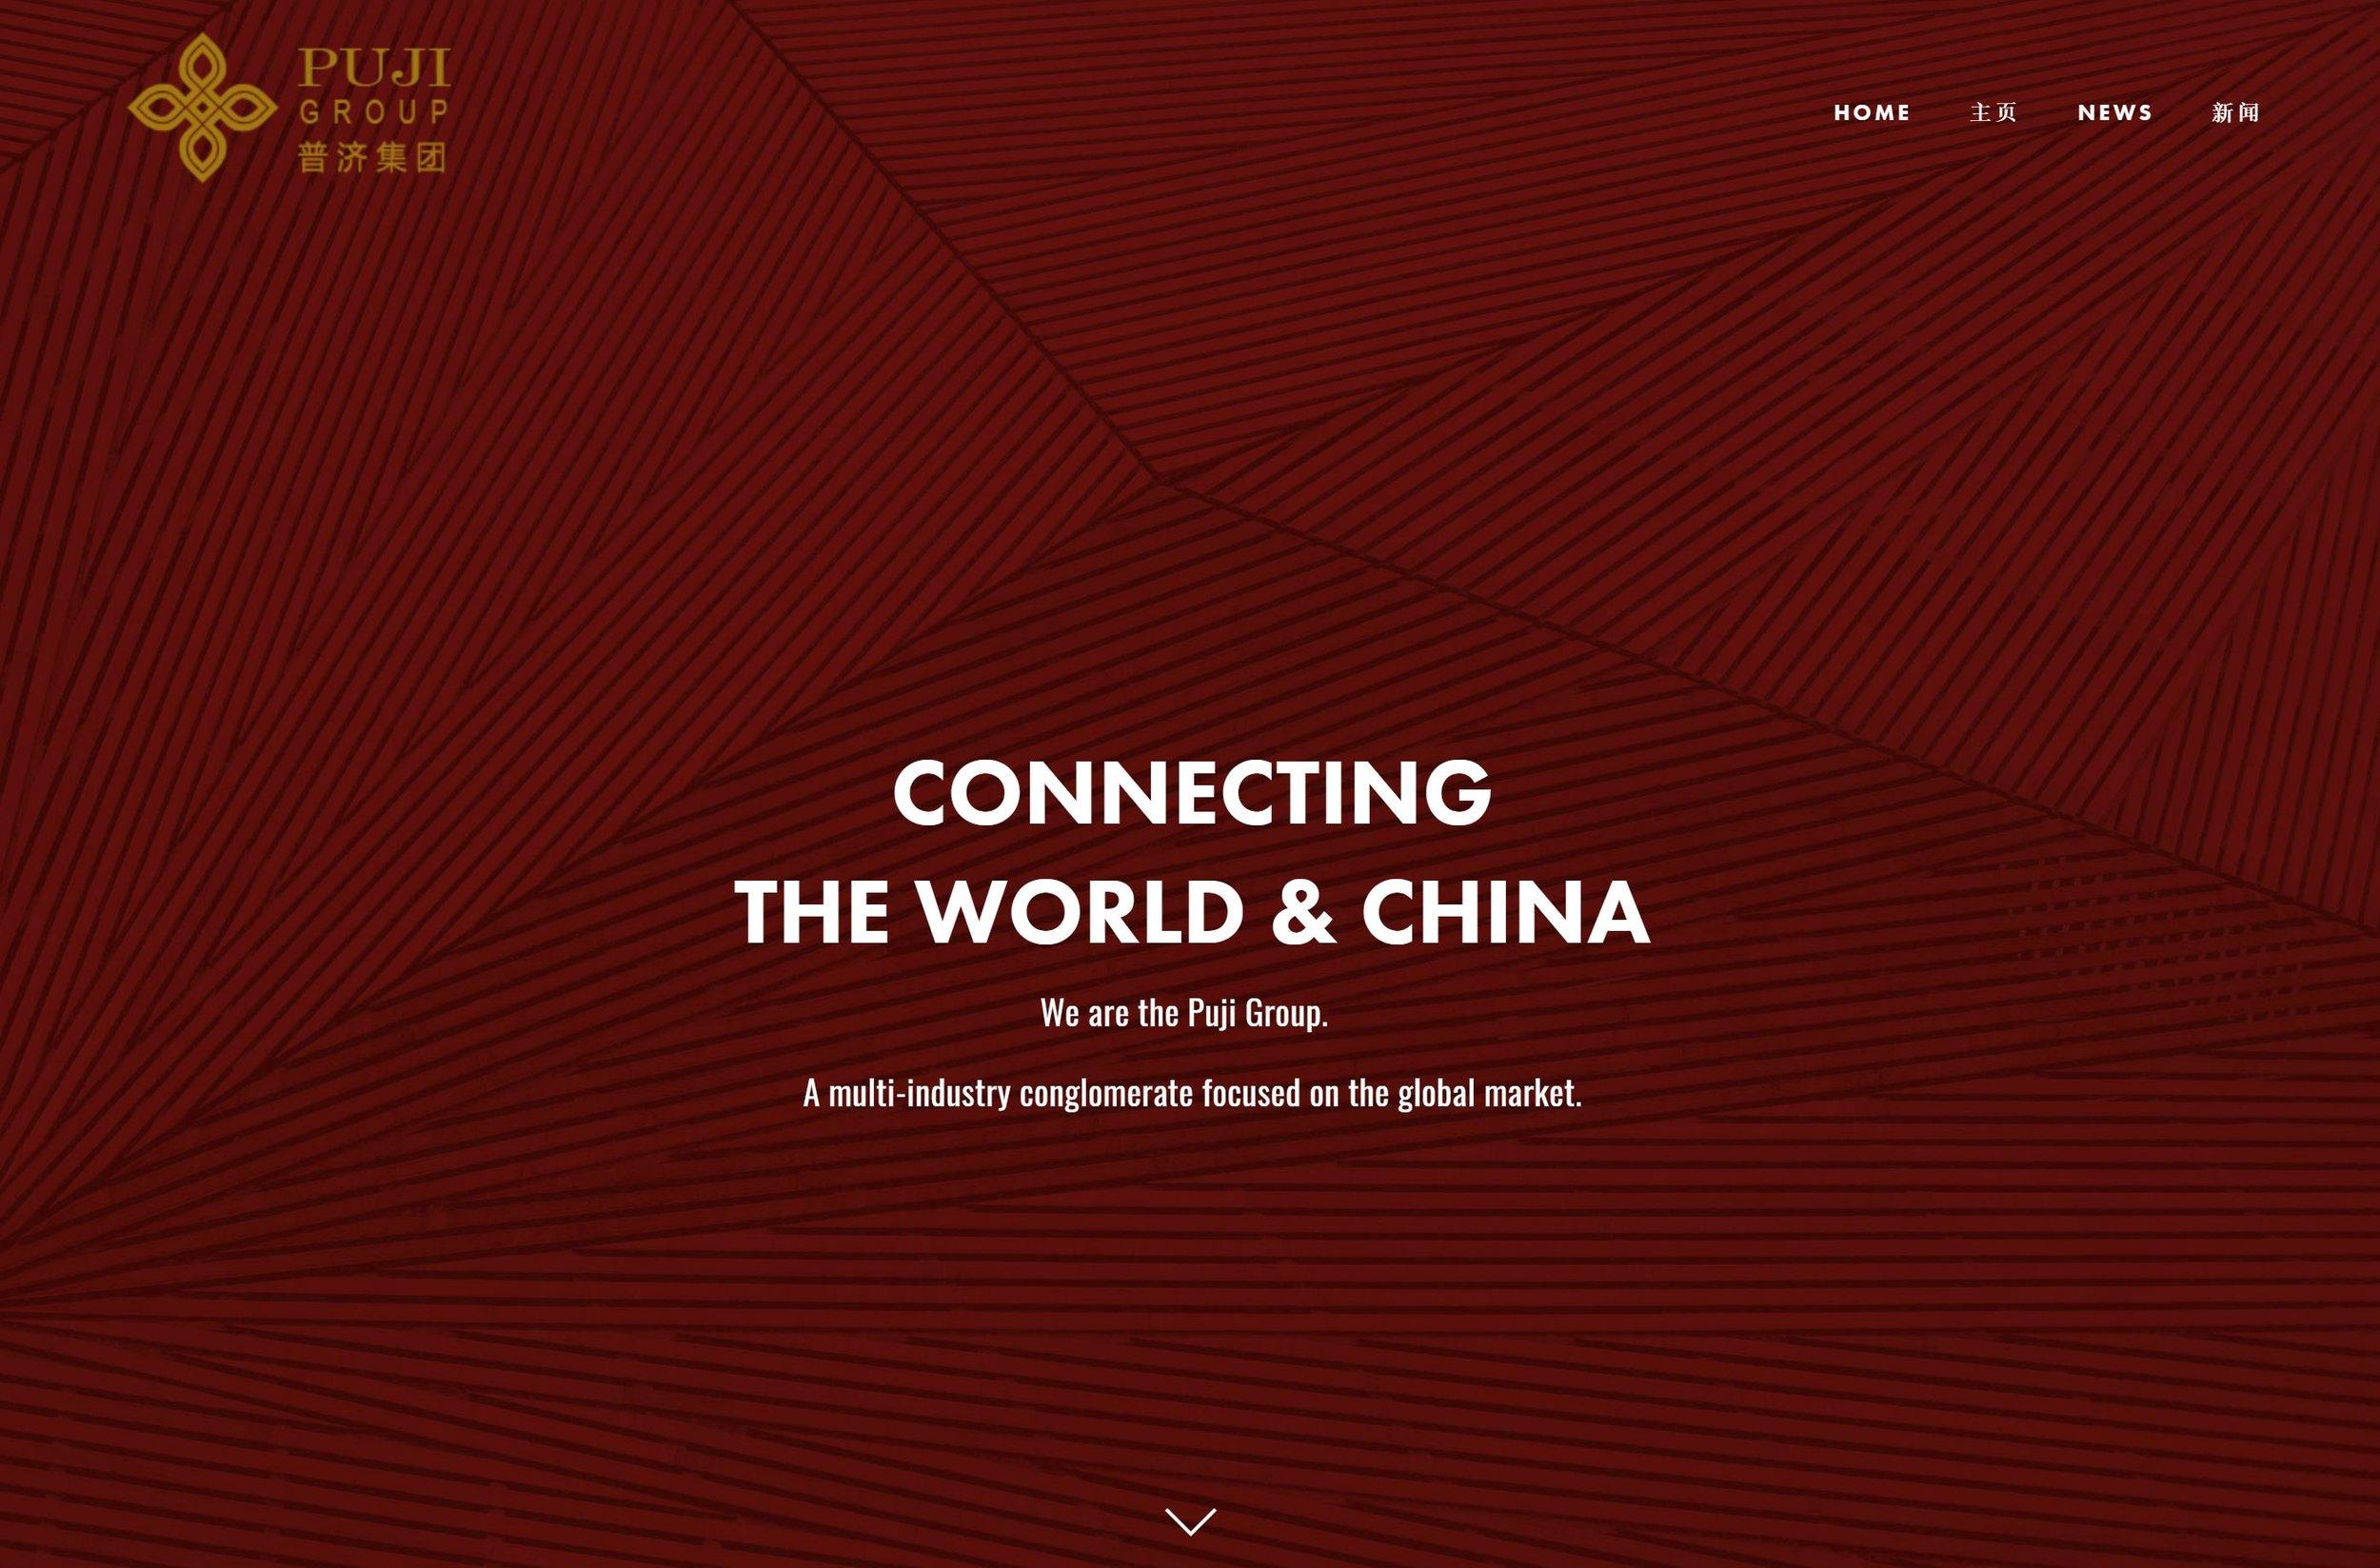 Squarespace Web Design  - Migrated from Wordpress to SquarespaceSite Design